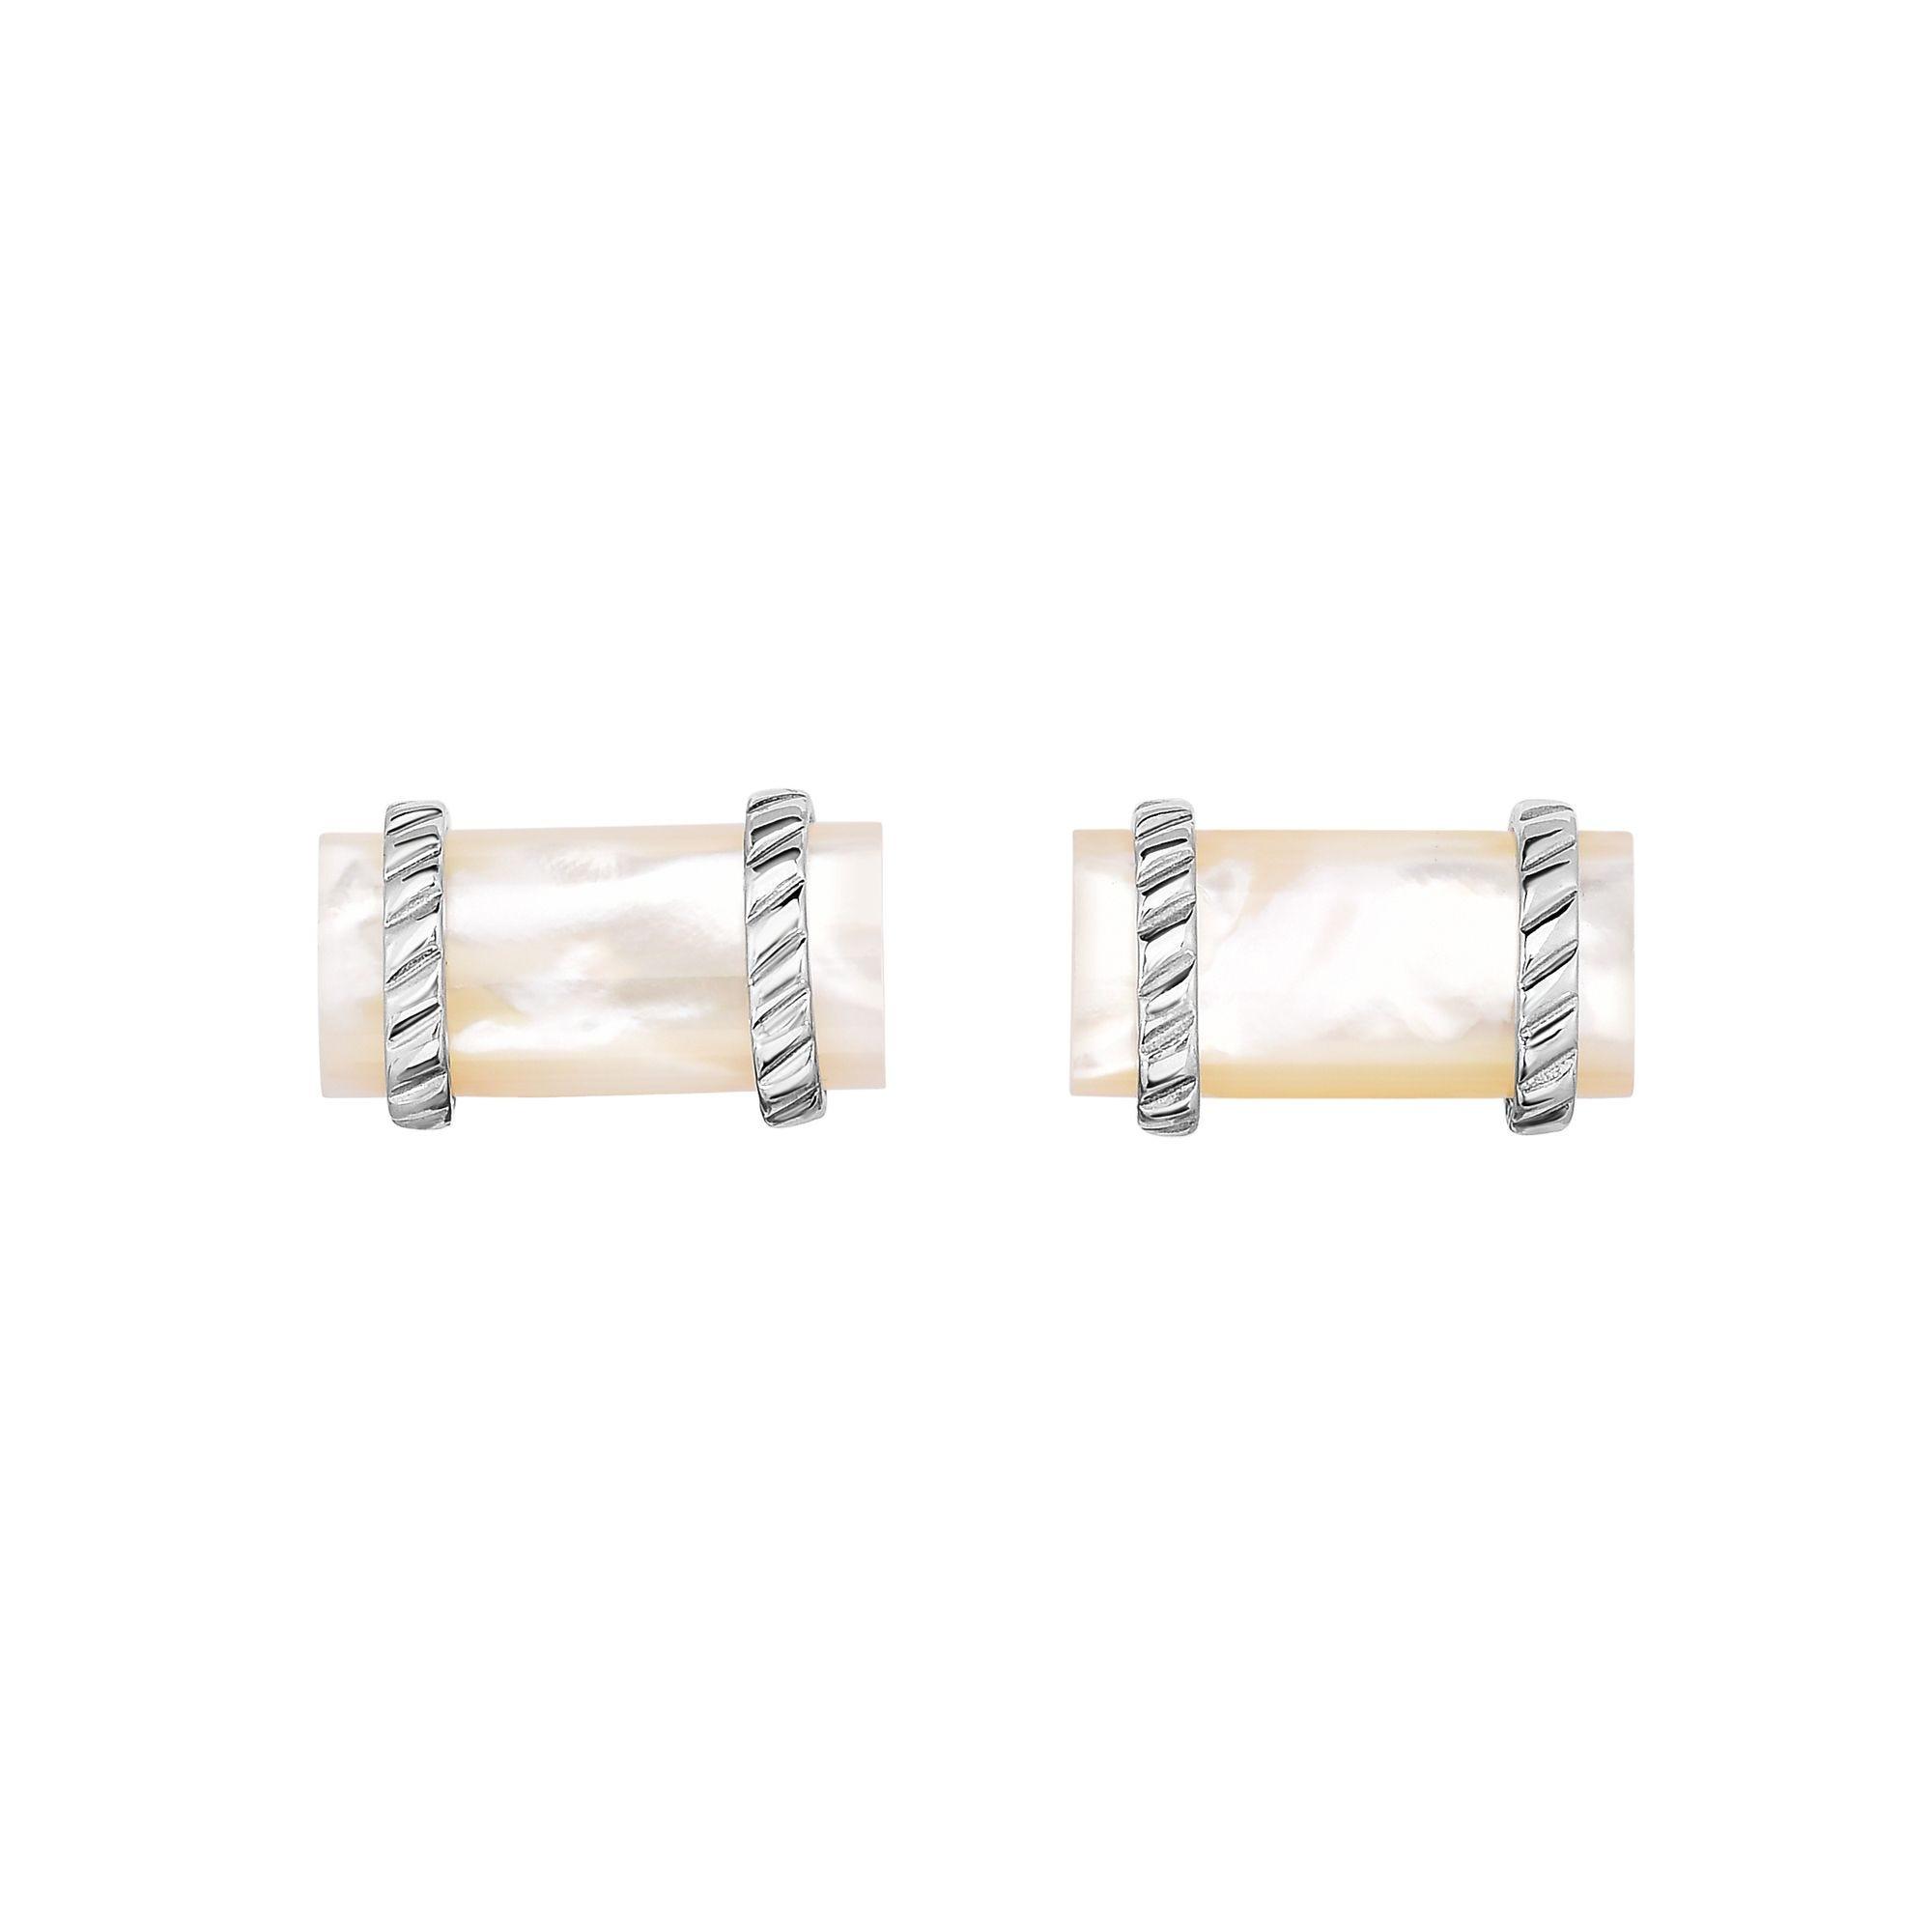 Cylinder Cufflinks 22x13mm in Sterling Silver